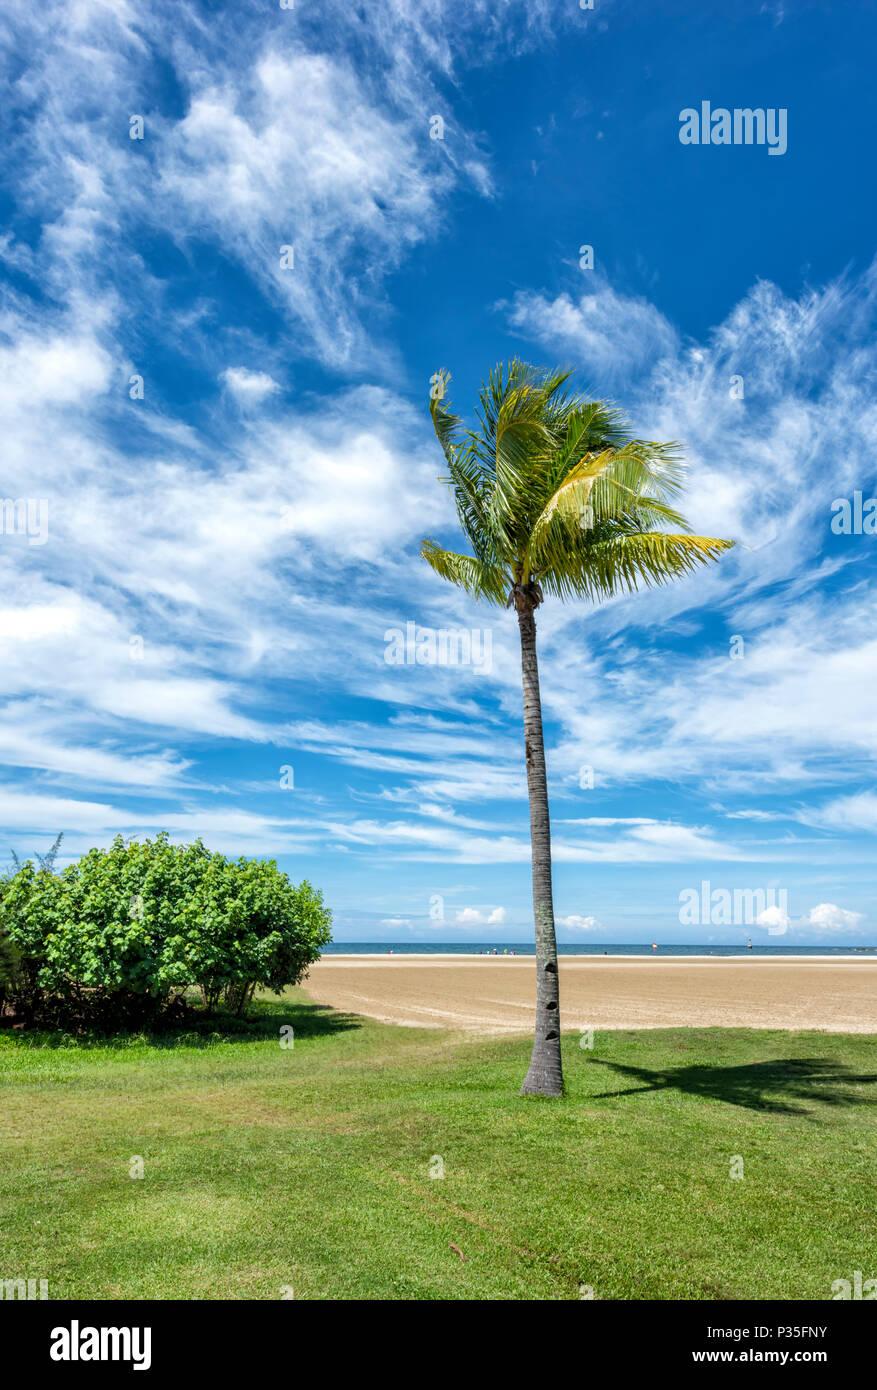 Solitary Palm Tree on the beach at Kota Kinabalu, Borneo, Malaysia - Stock Image